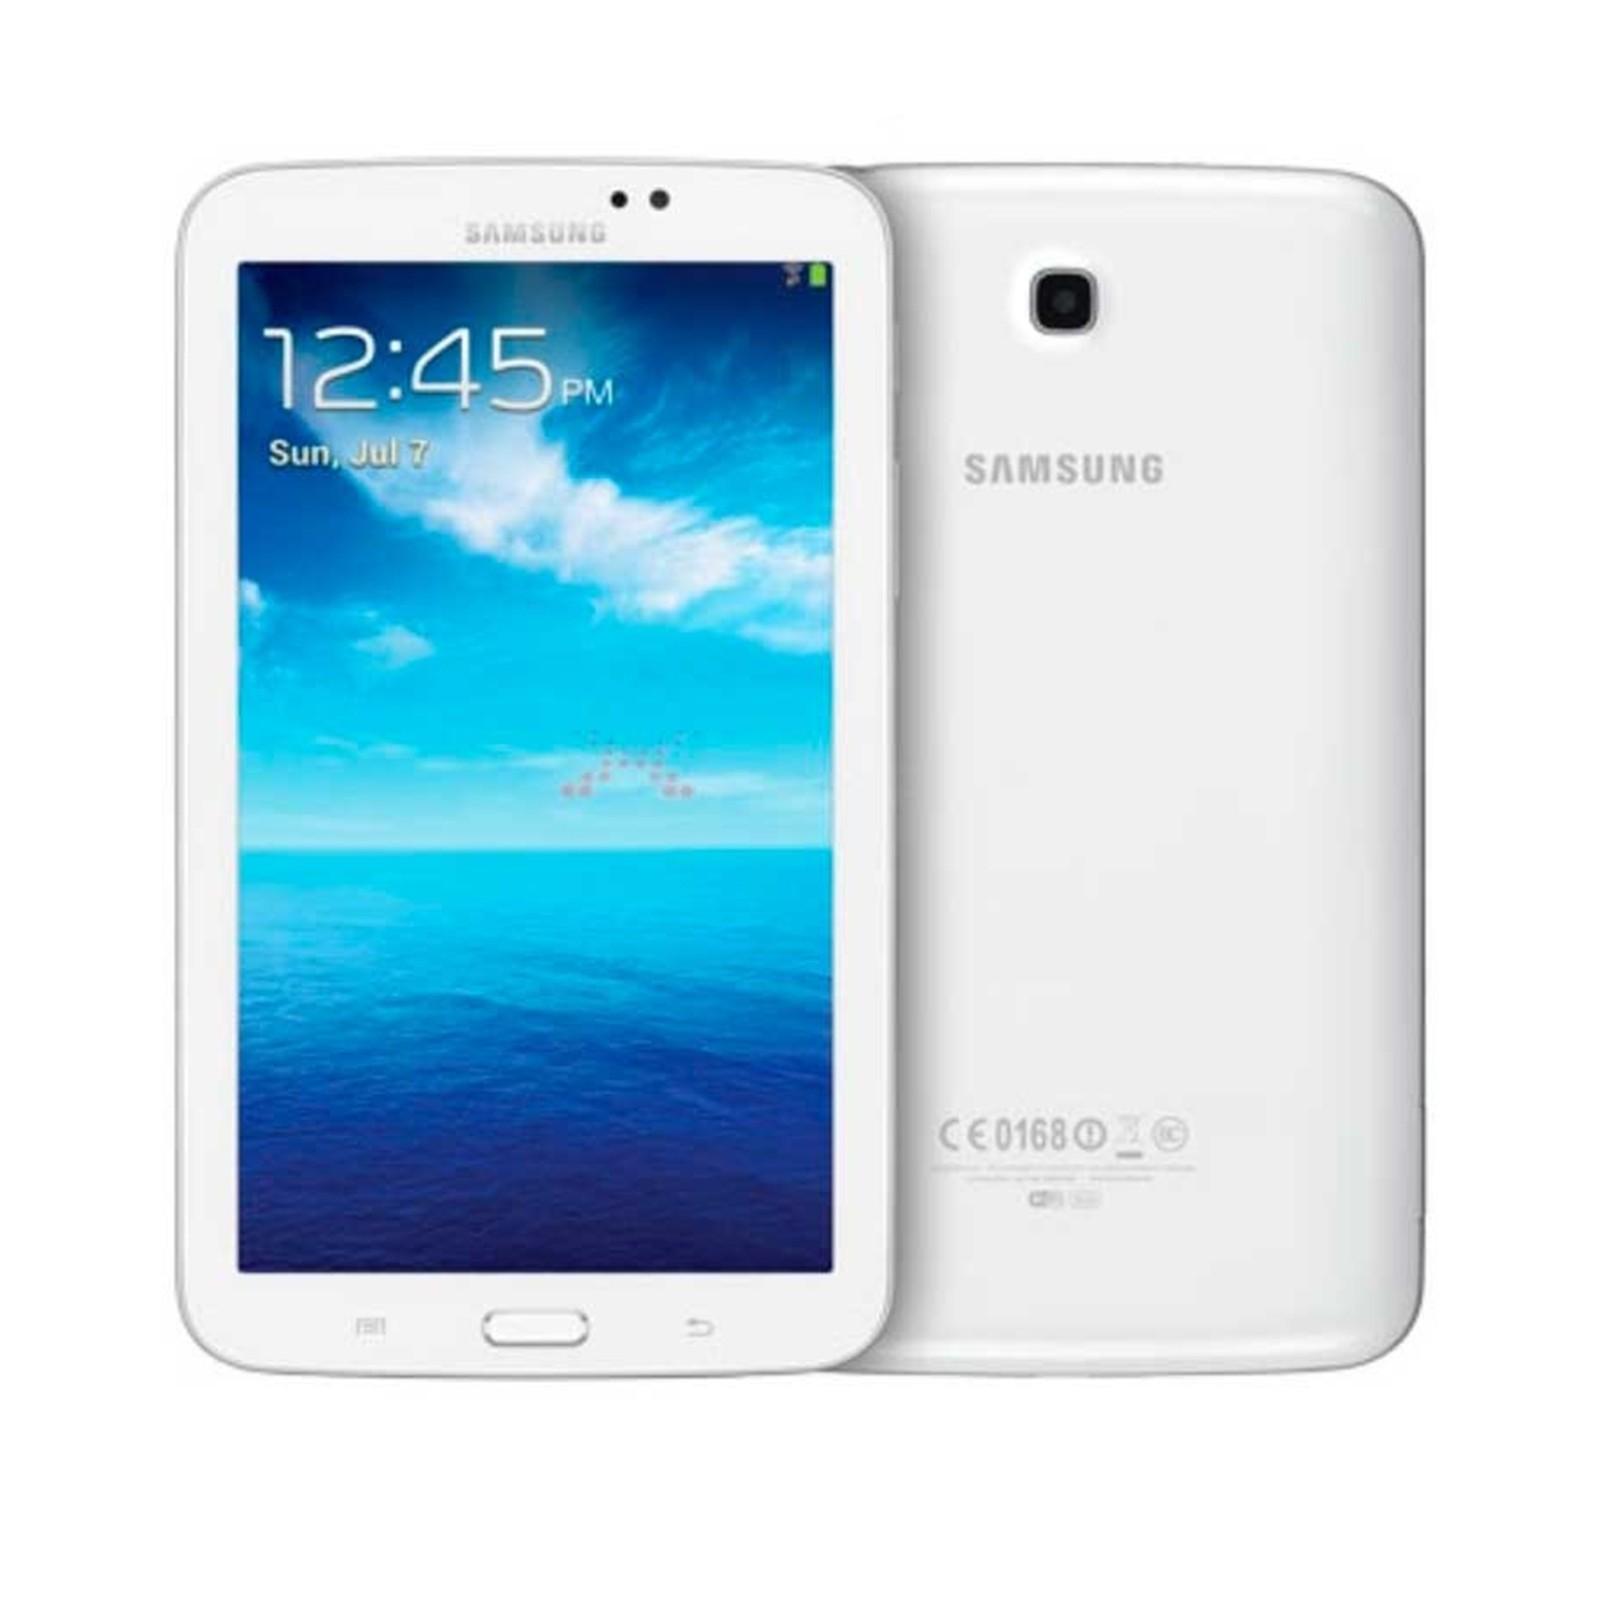 Mejores Carcasas Personalizadas GALAXY TAB 3 7.0 T211 3G